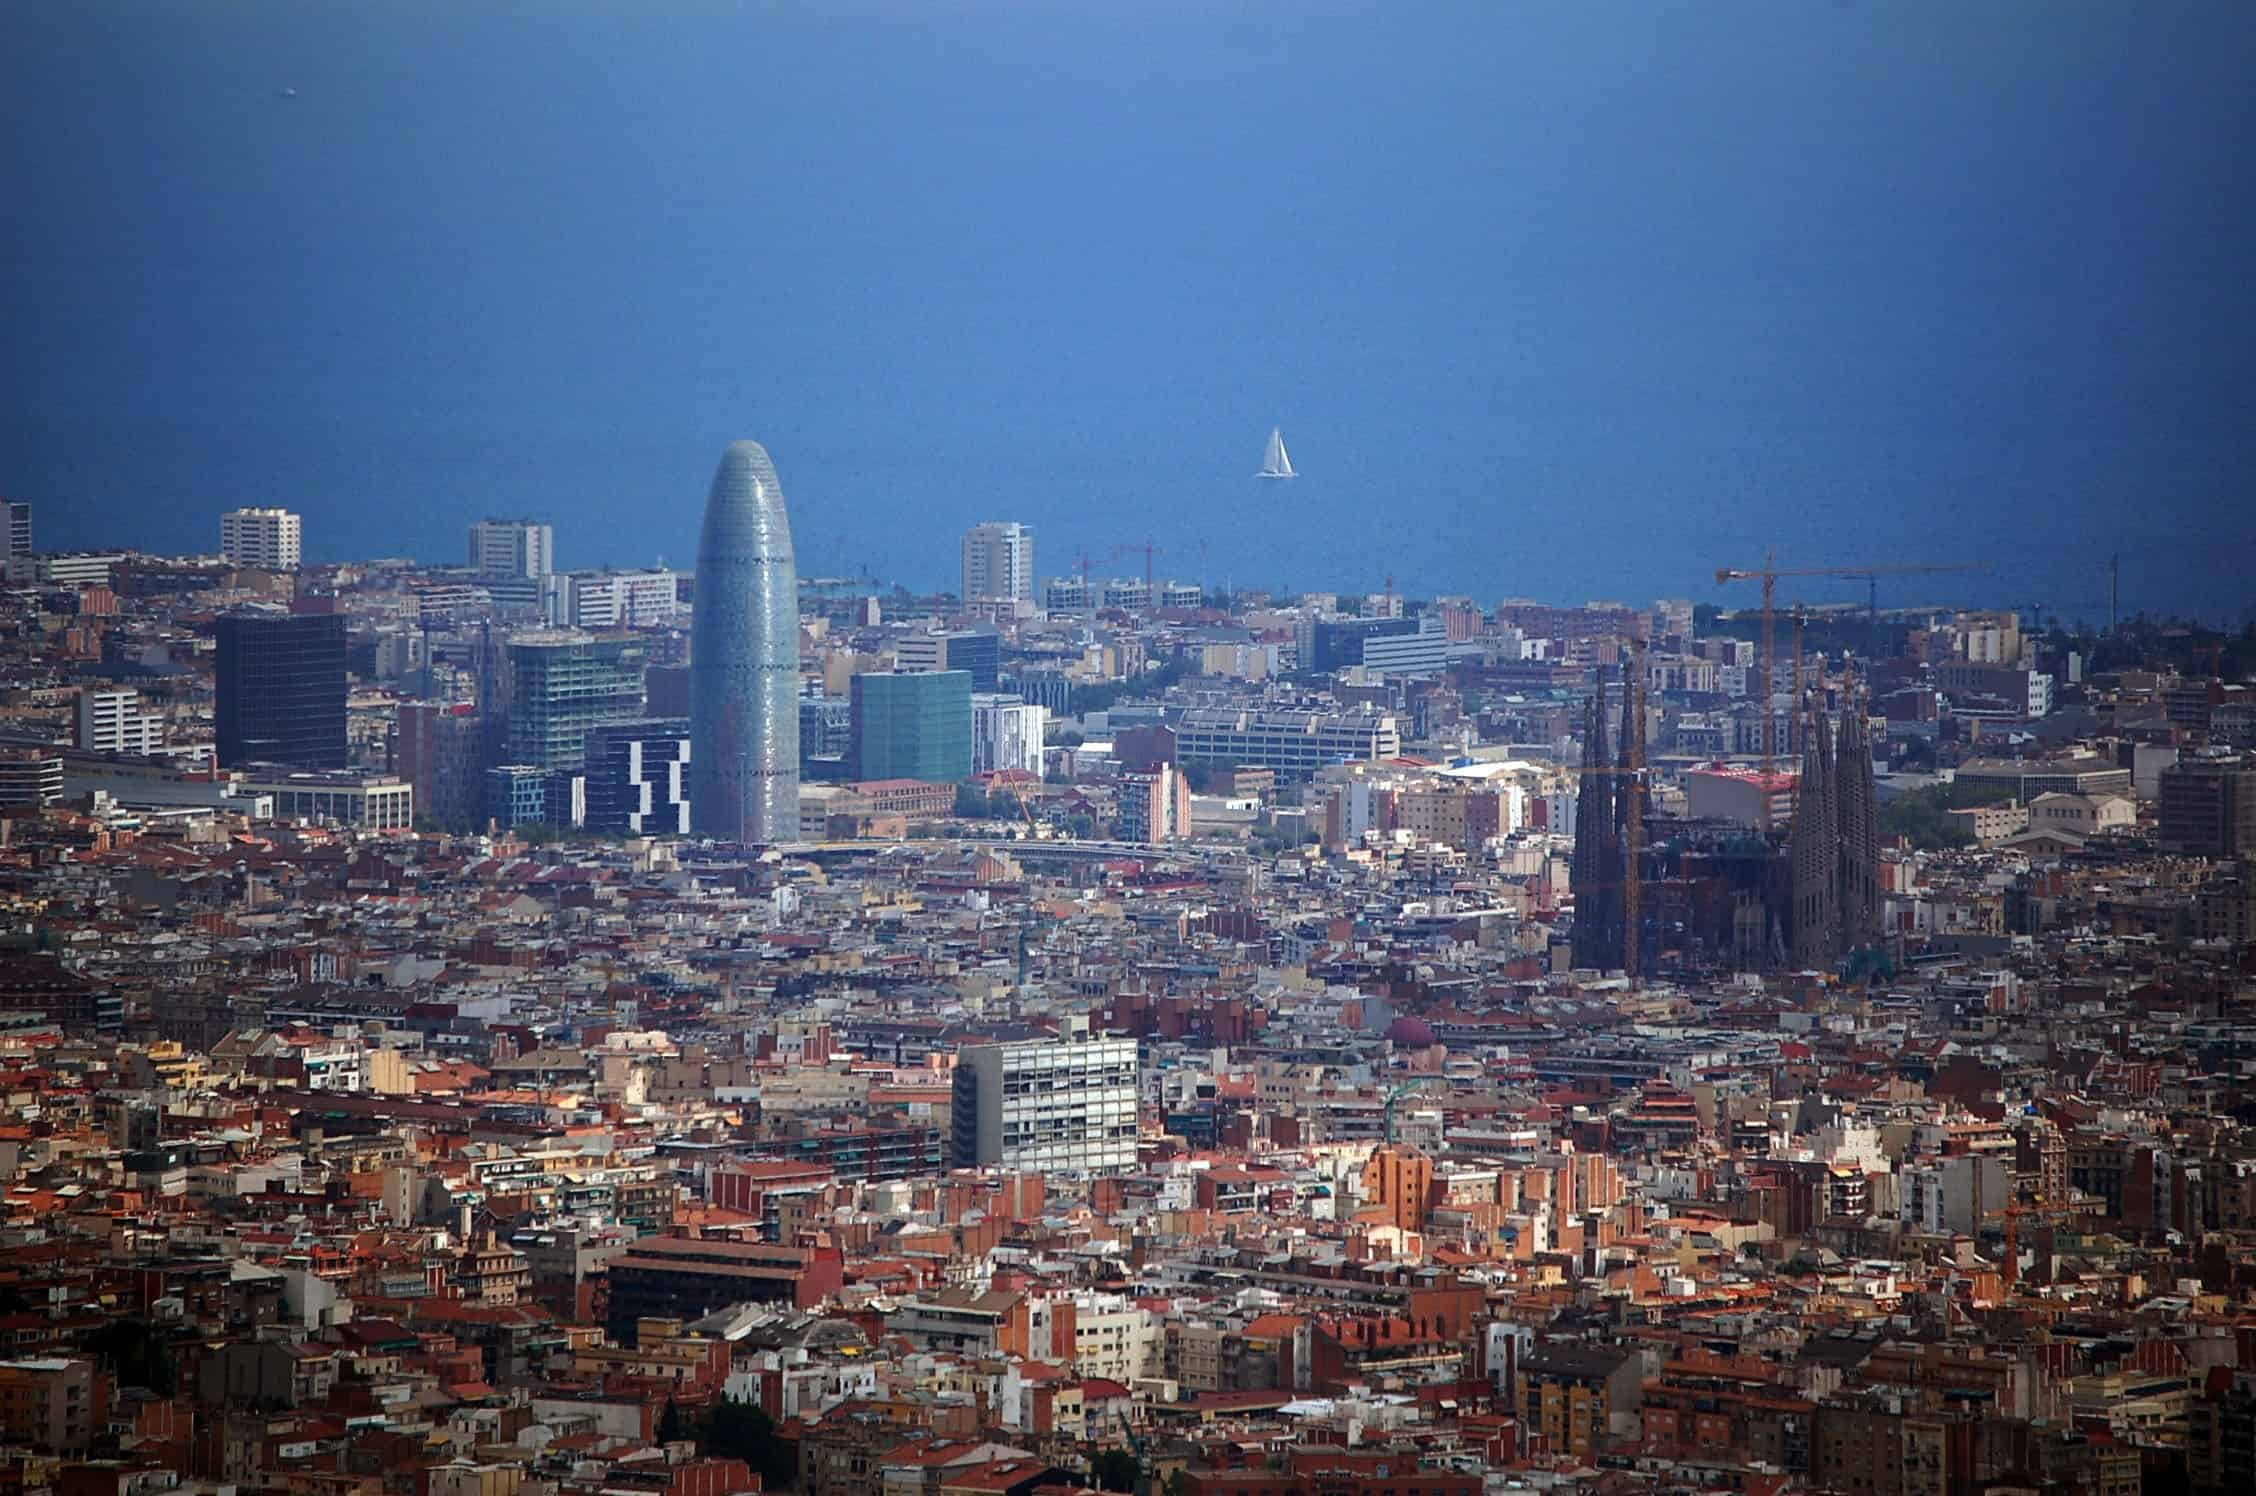 Barcelona pisos casas lujo